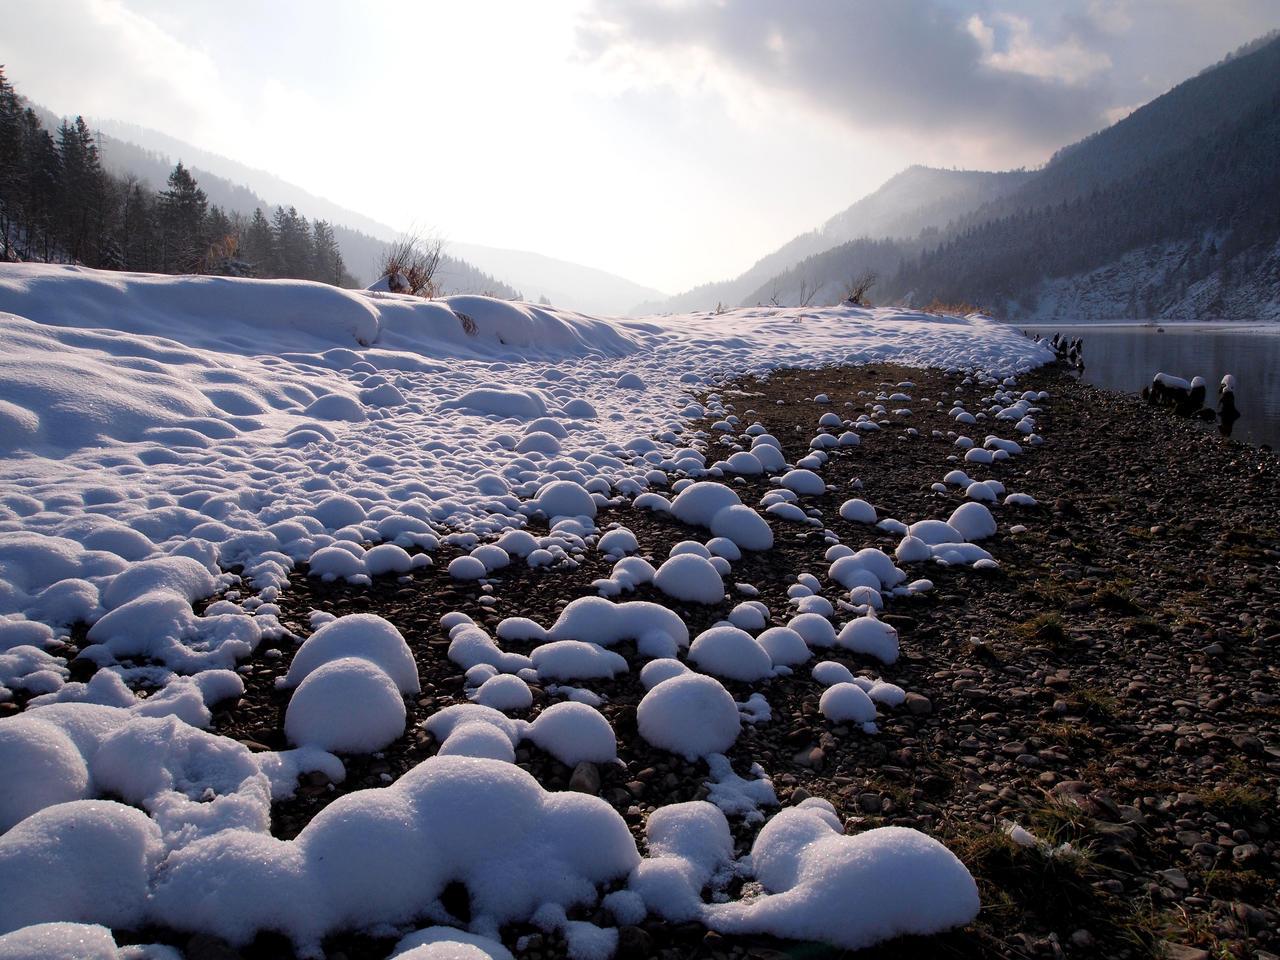 Snowballs by Burtn